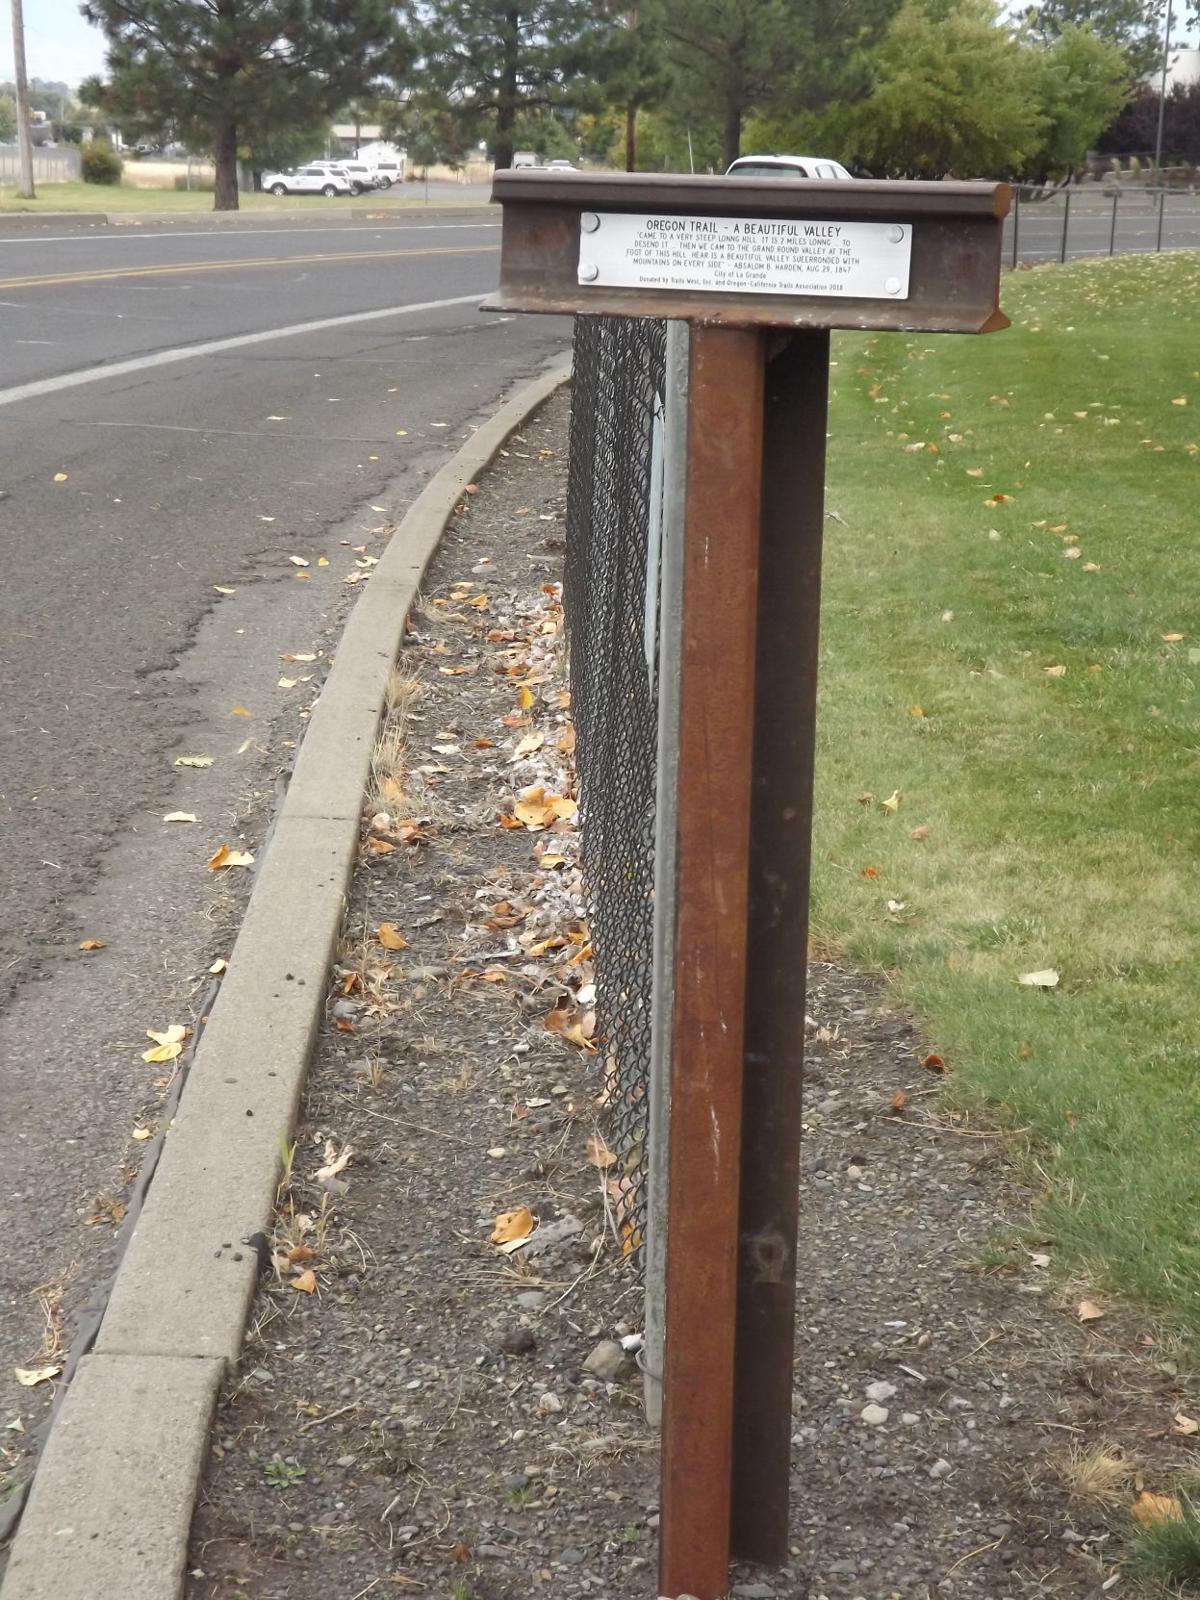 Oregon Trail marker 2